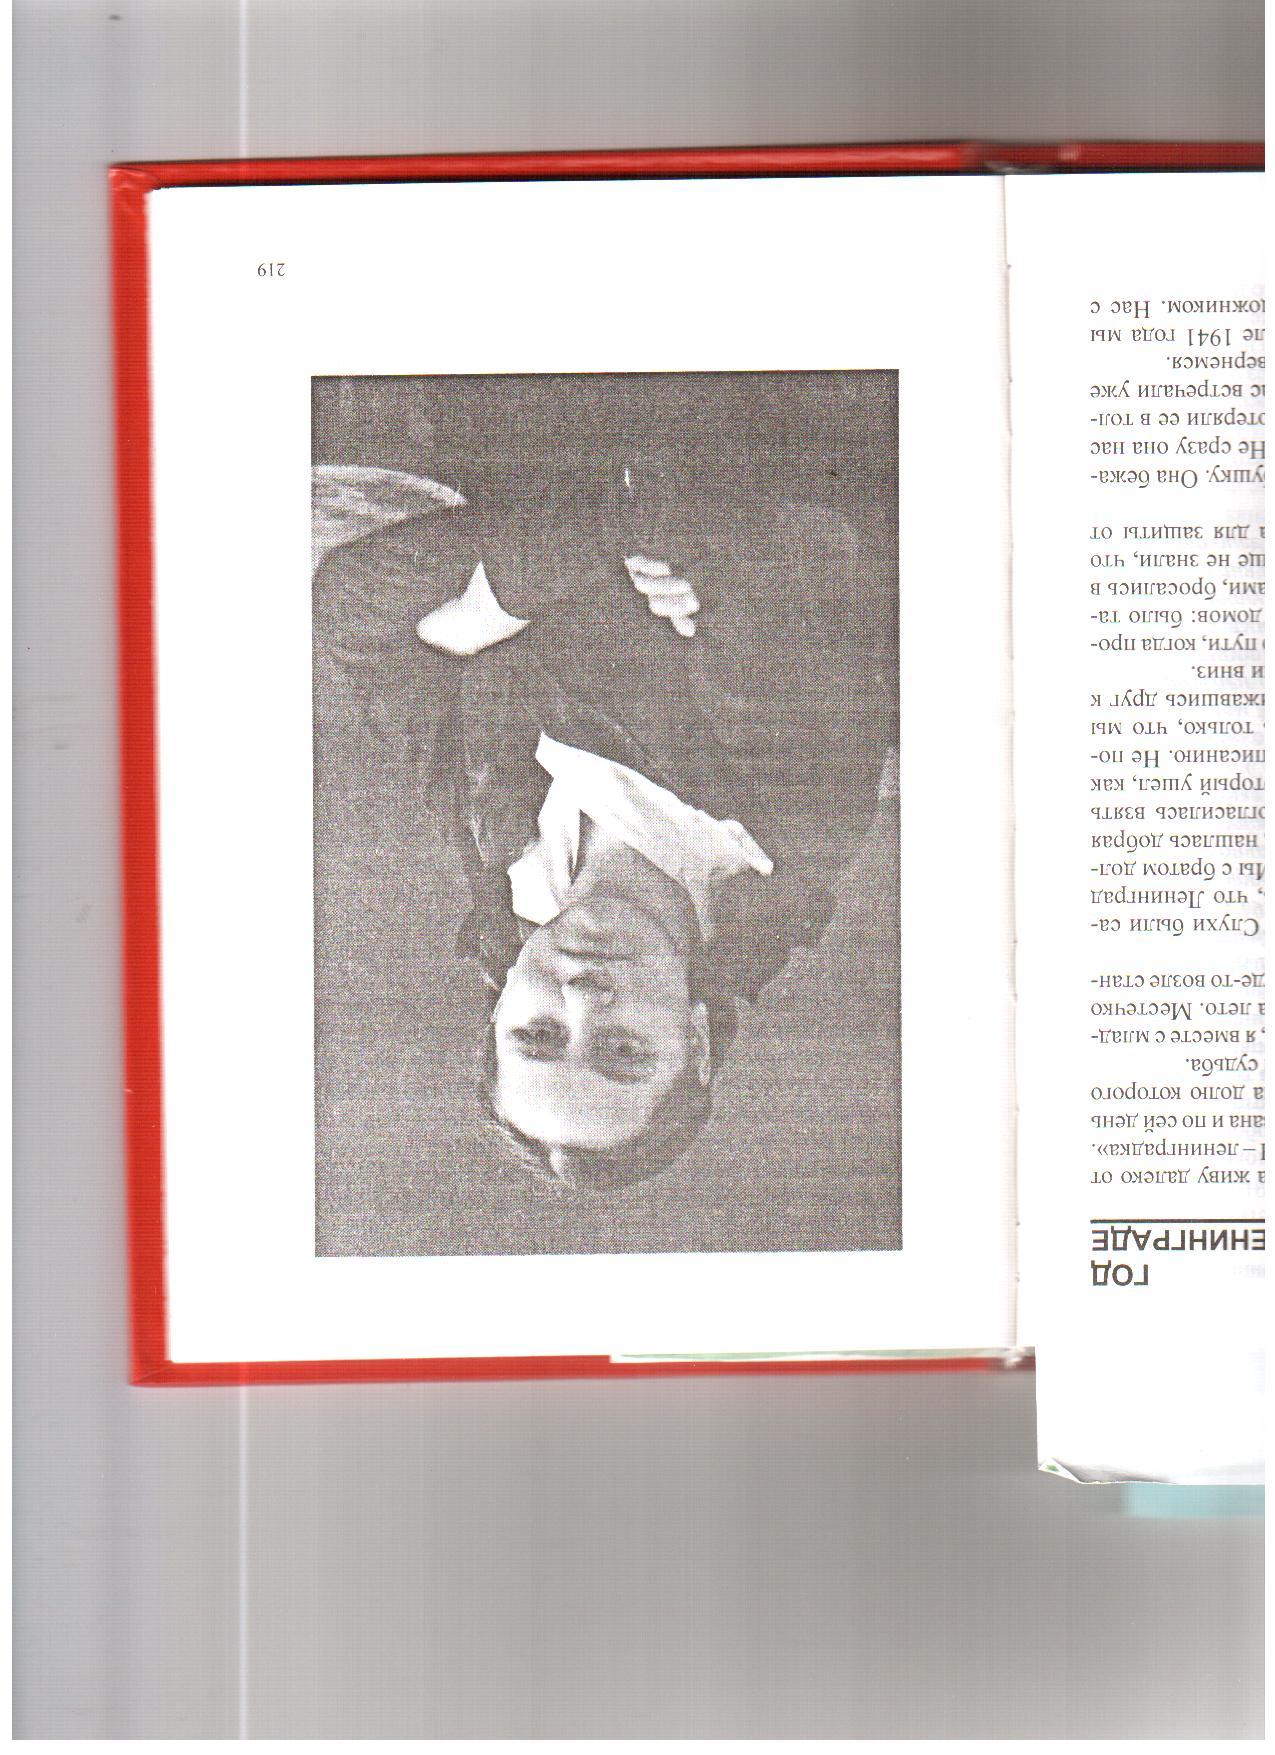 C:\Documents and Settings\Admin\Рабочий стол\ленинград\проект 21 школа\Блокада музей\Изображение 073.jpg